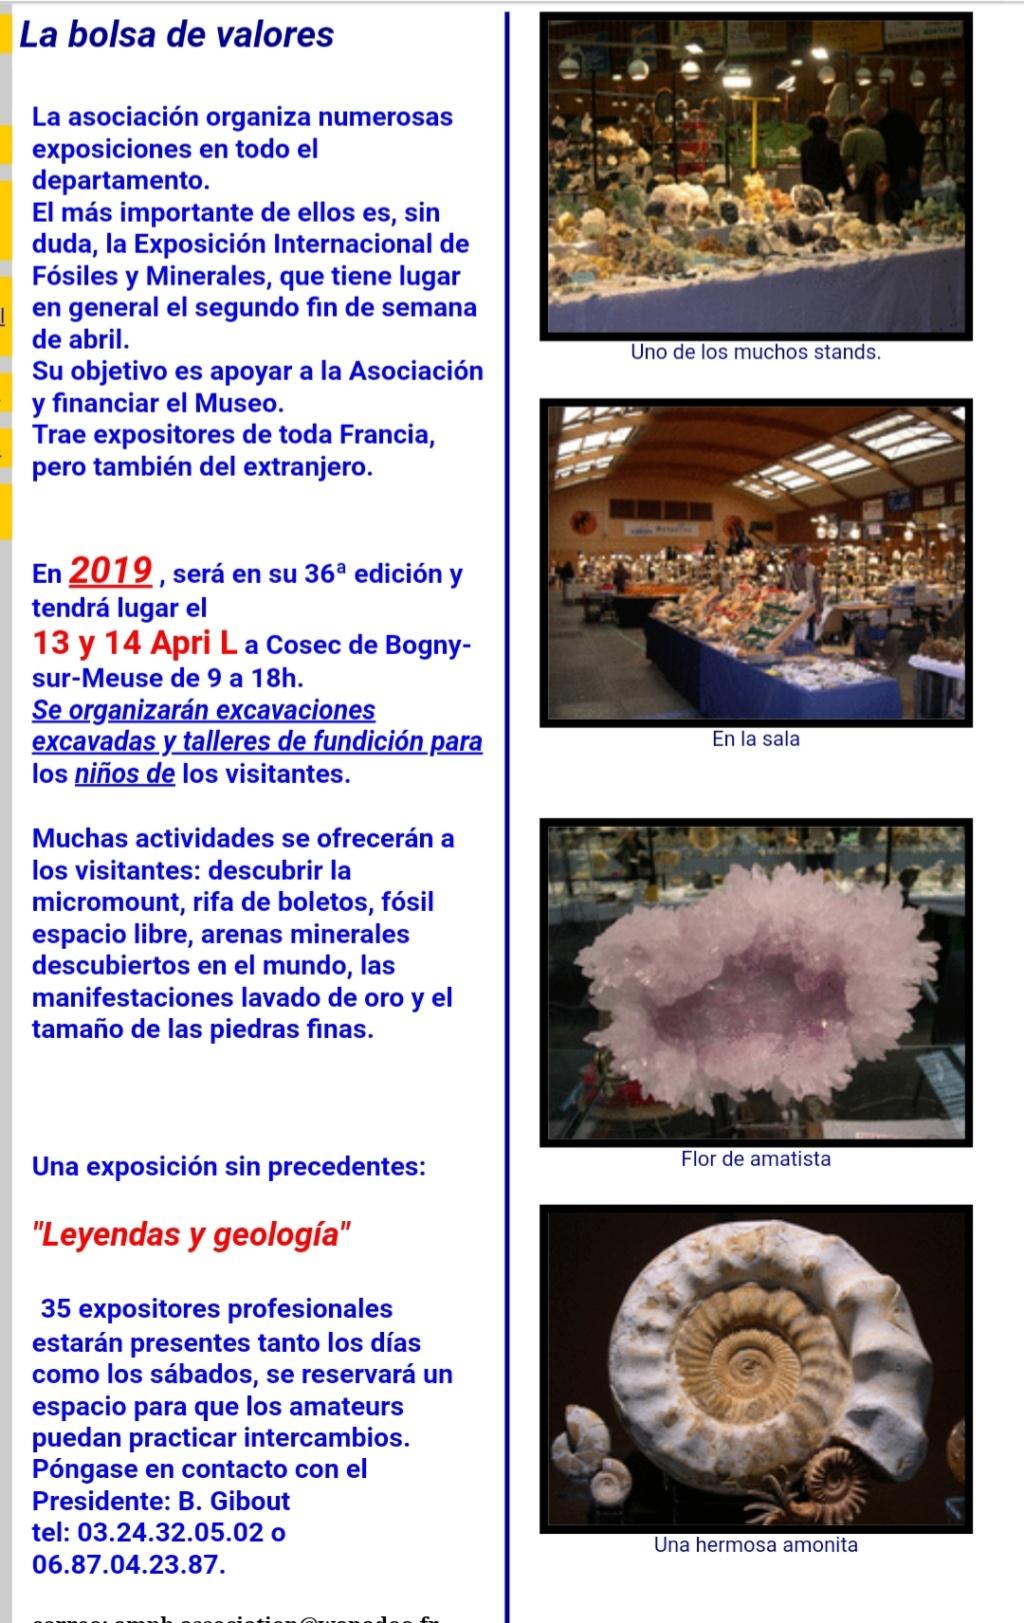 Ferias y eventos mes de Abril 2019. 20190314